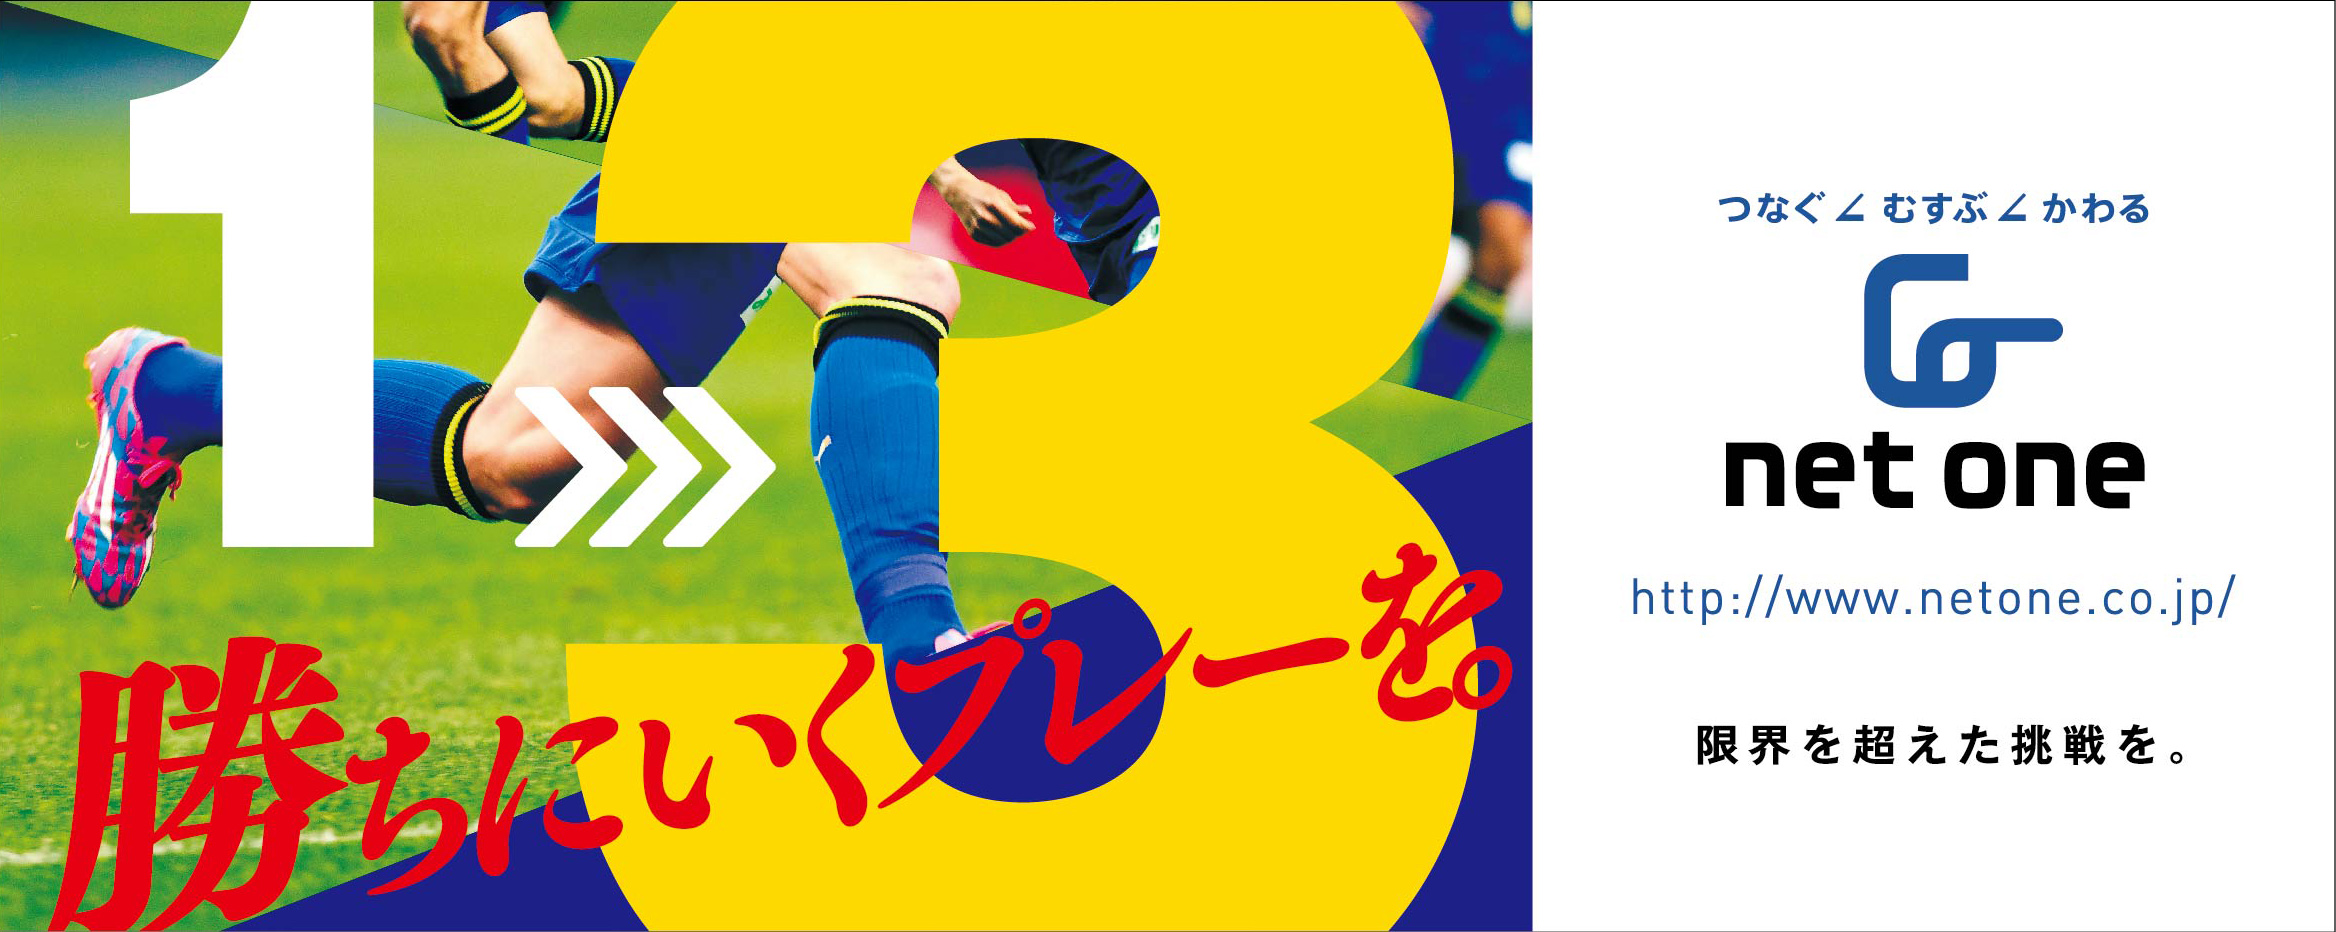 NetOne OITA TRINITA 20150524 第15節 東京ヴェルディ戦 広告